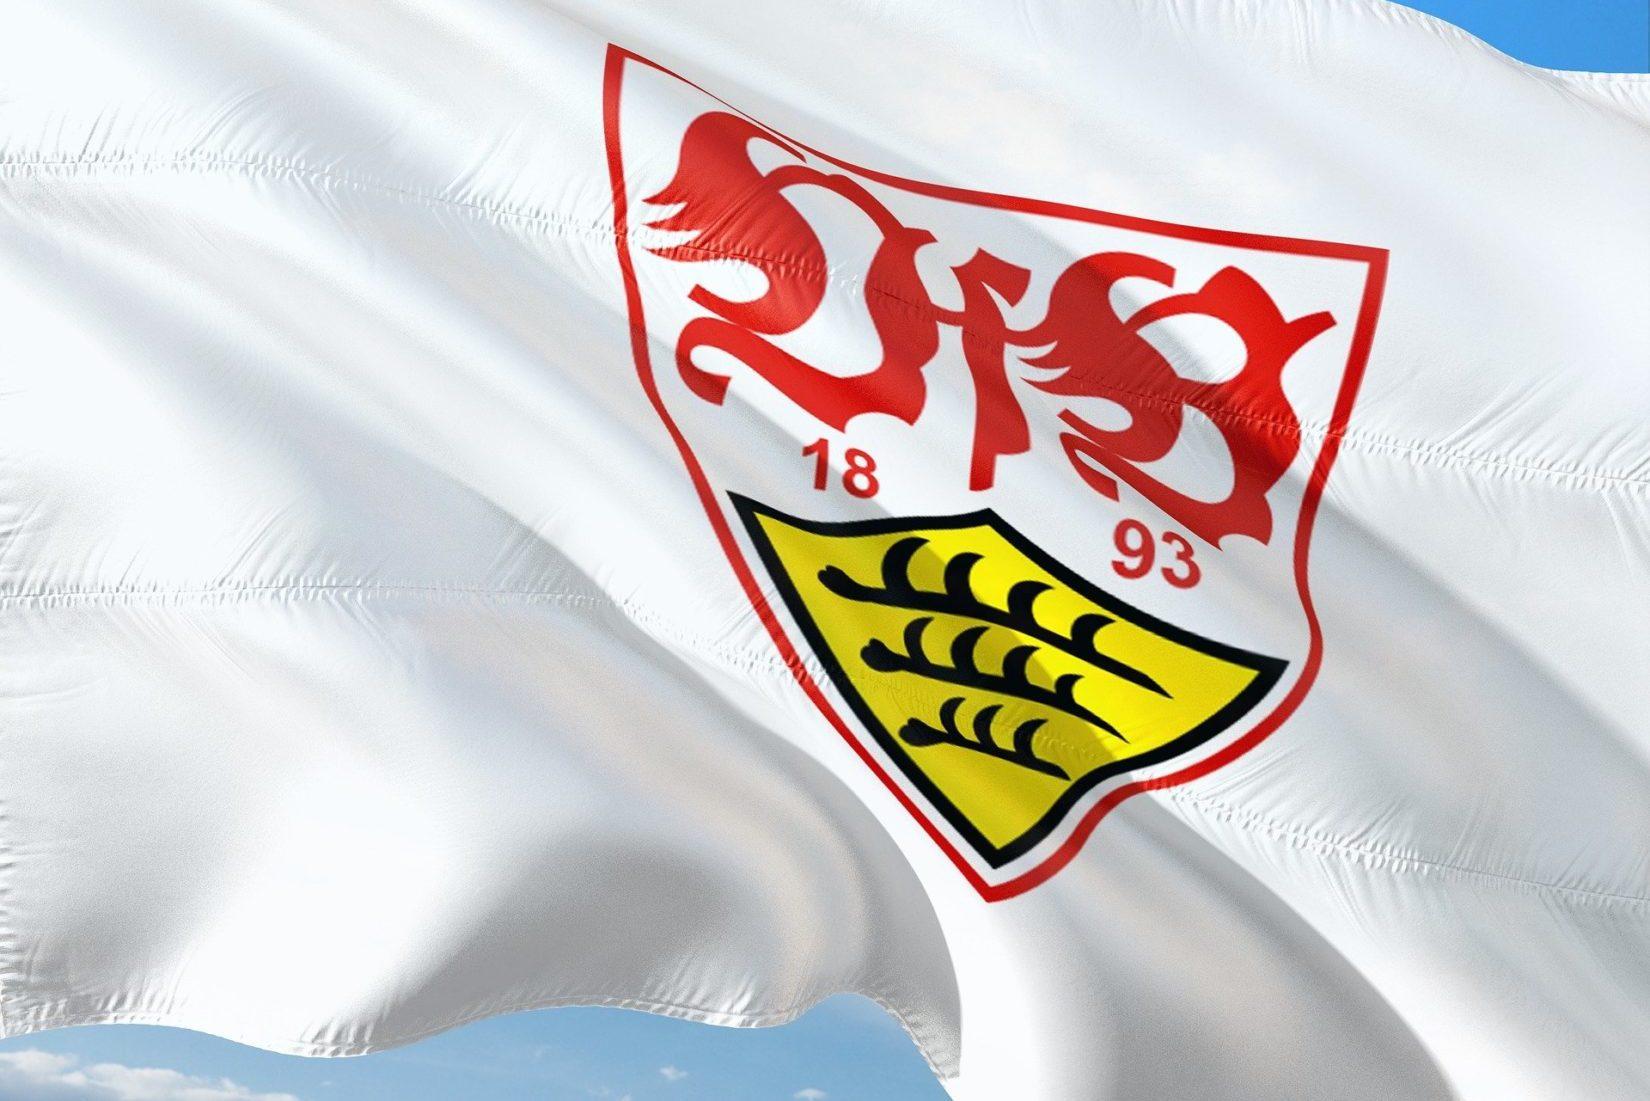 VfB Stuttgart – SV Darmstadt 981:3 (1:1)